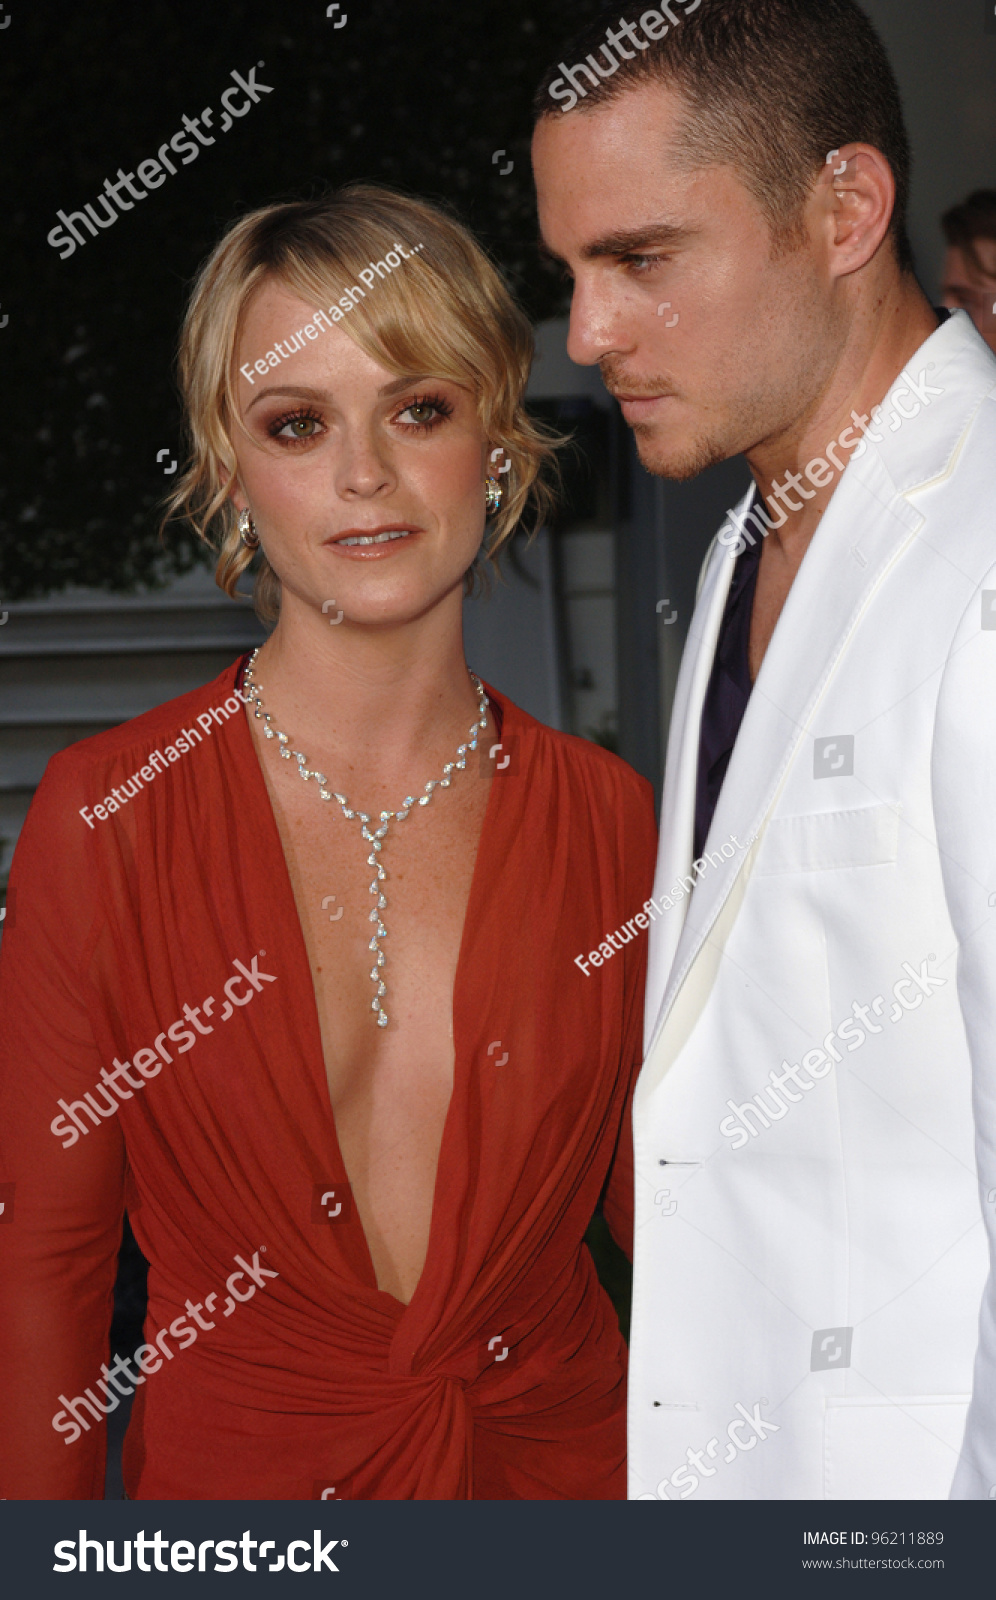 Actress Taryn Manning Boyfriend Los Angeles Stock Photo ...